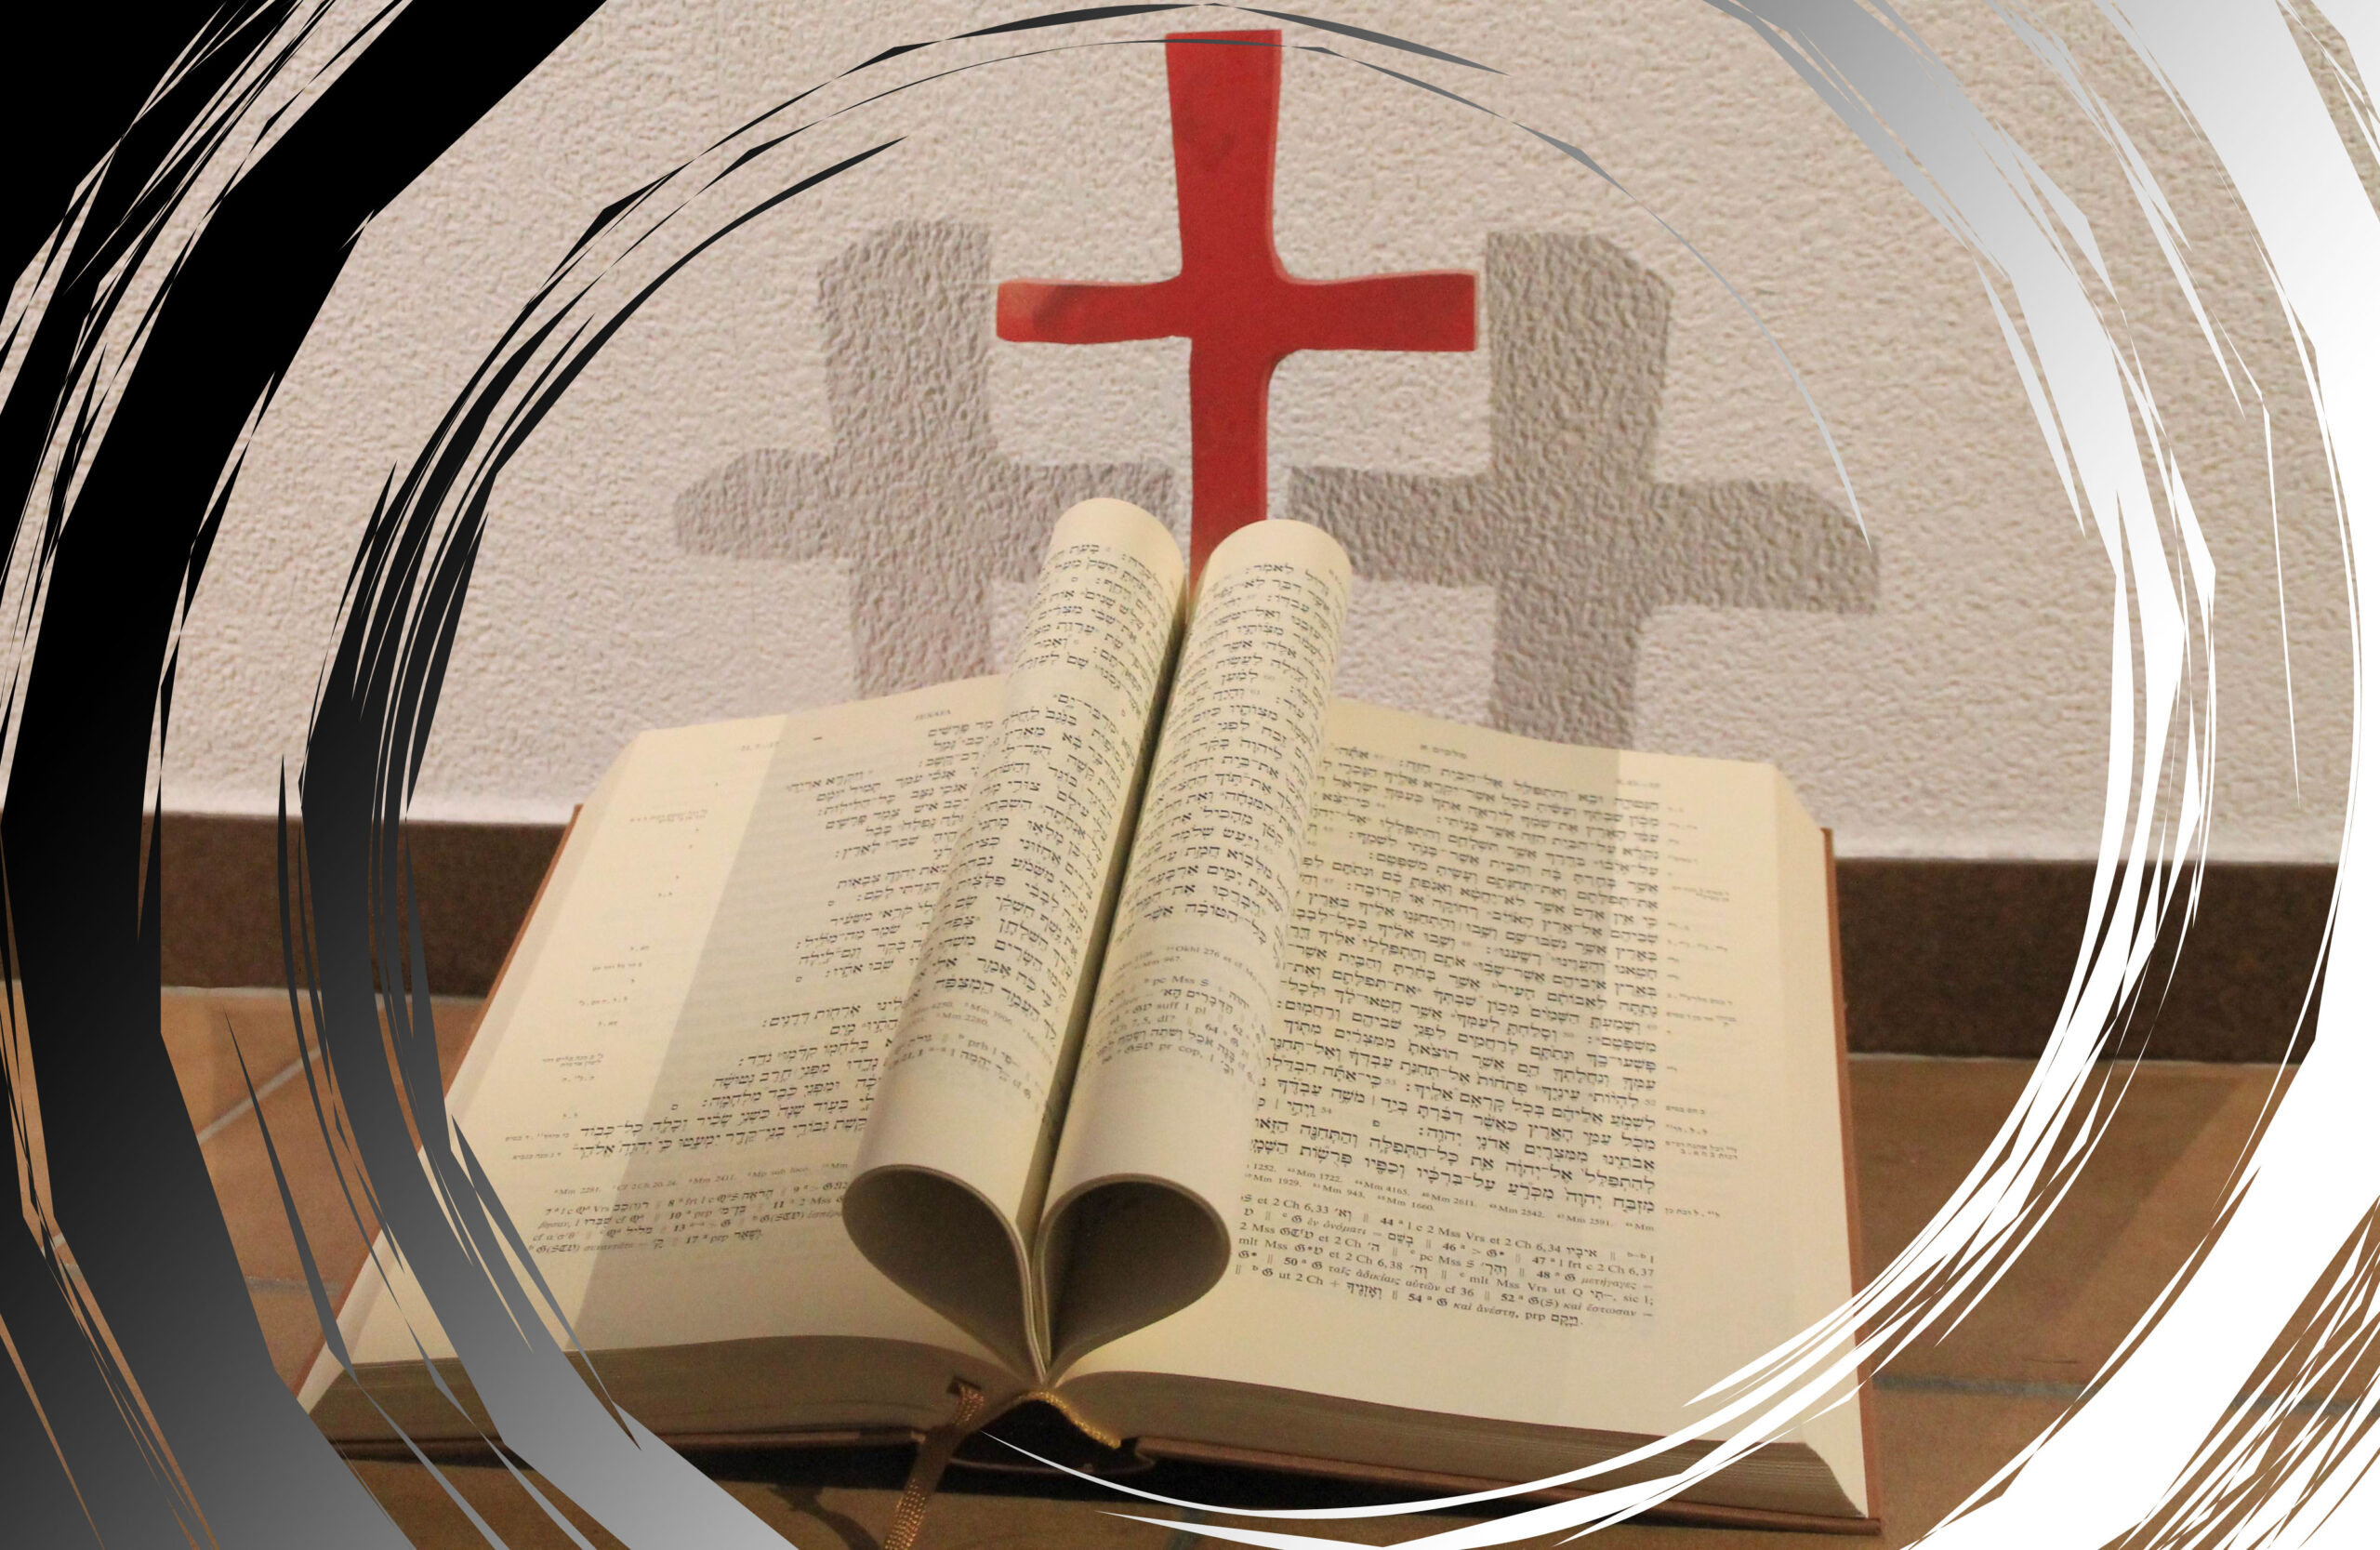 Bibel und Kreuz im Zentrum